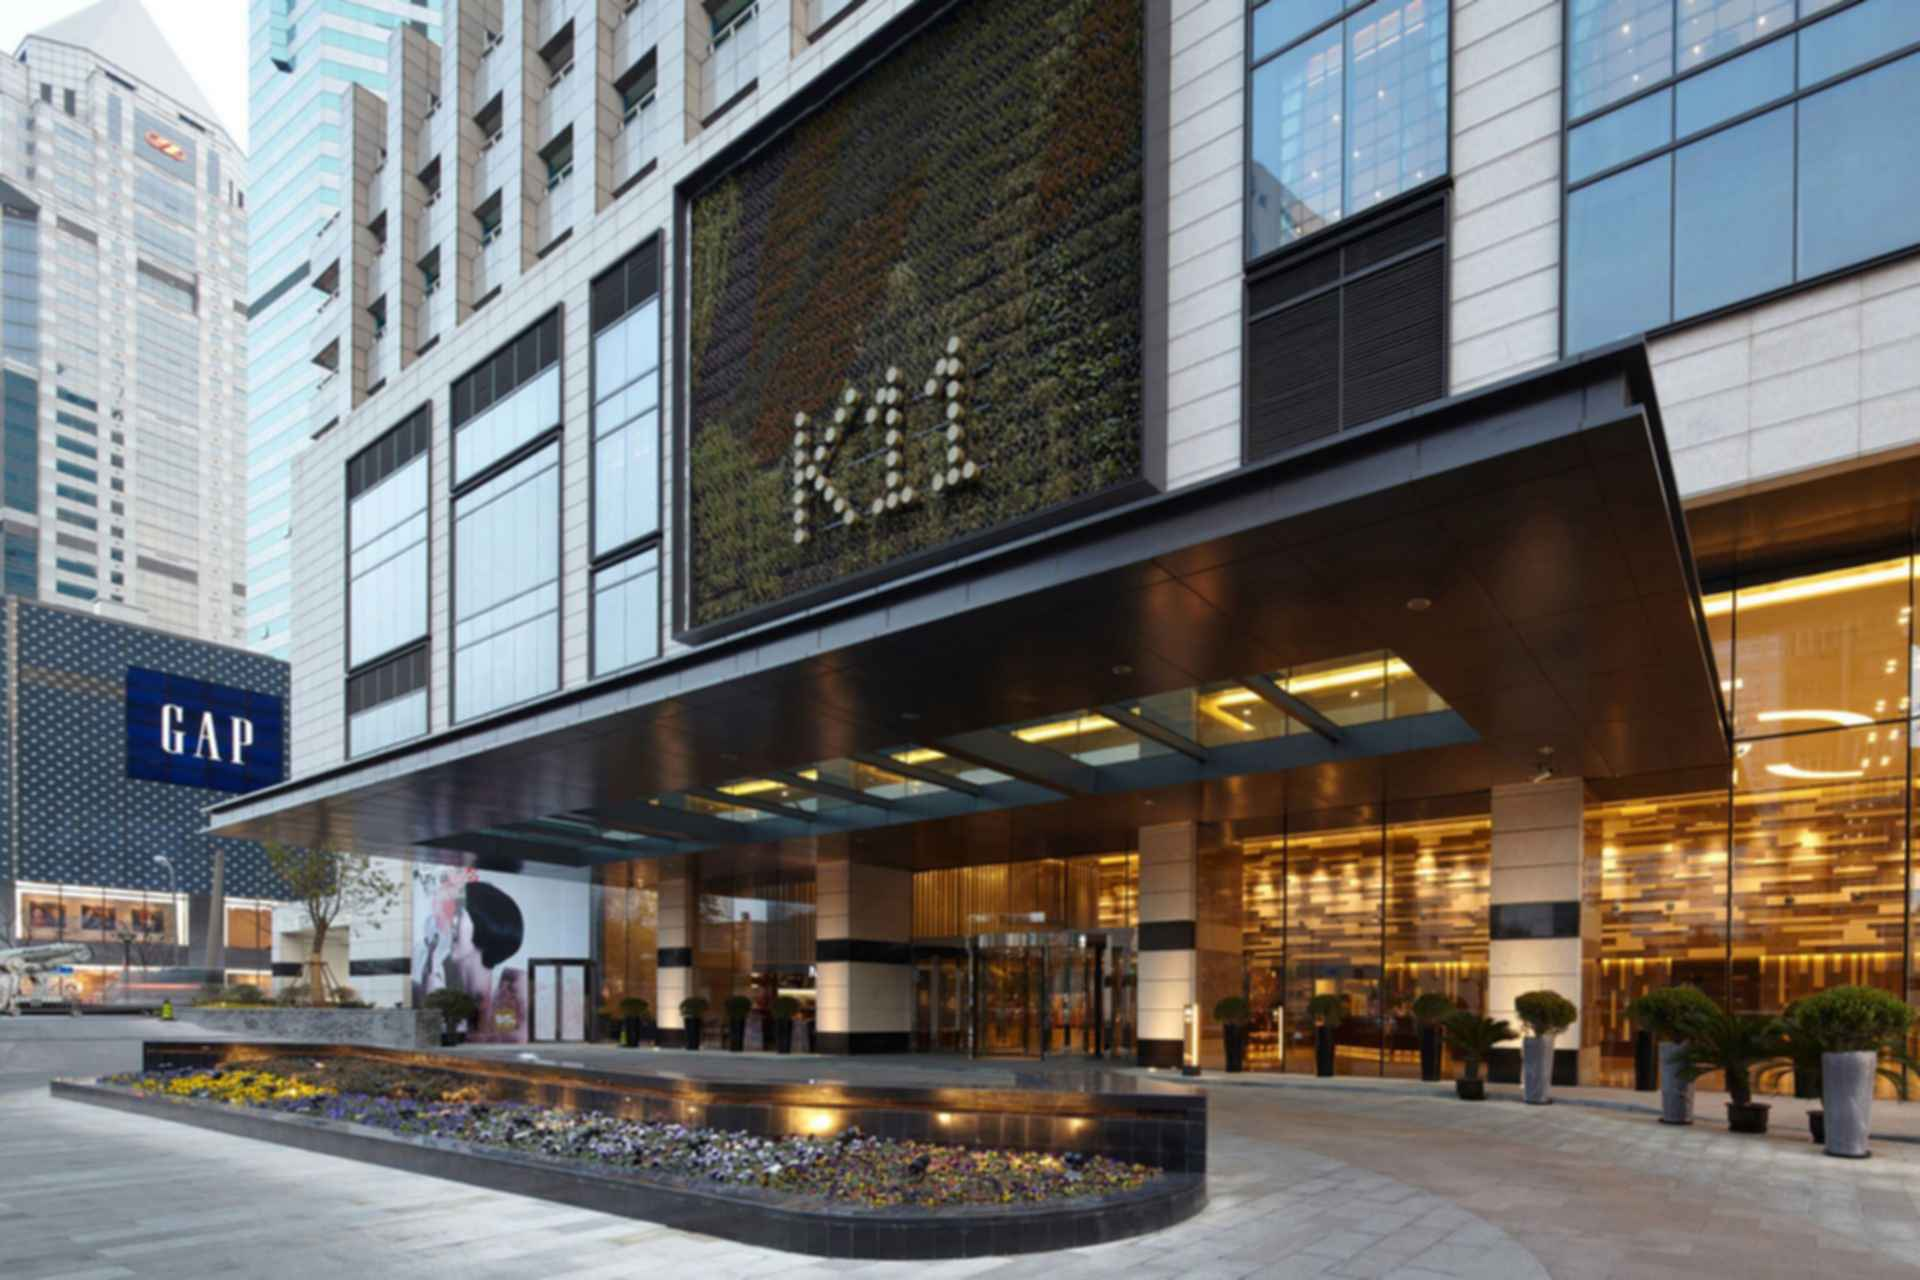 K11 Art Mall - entrance